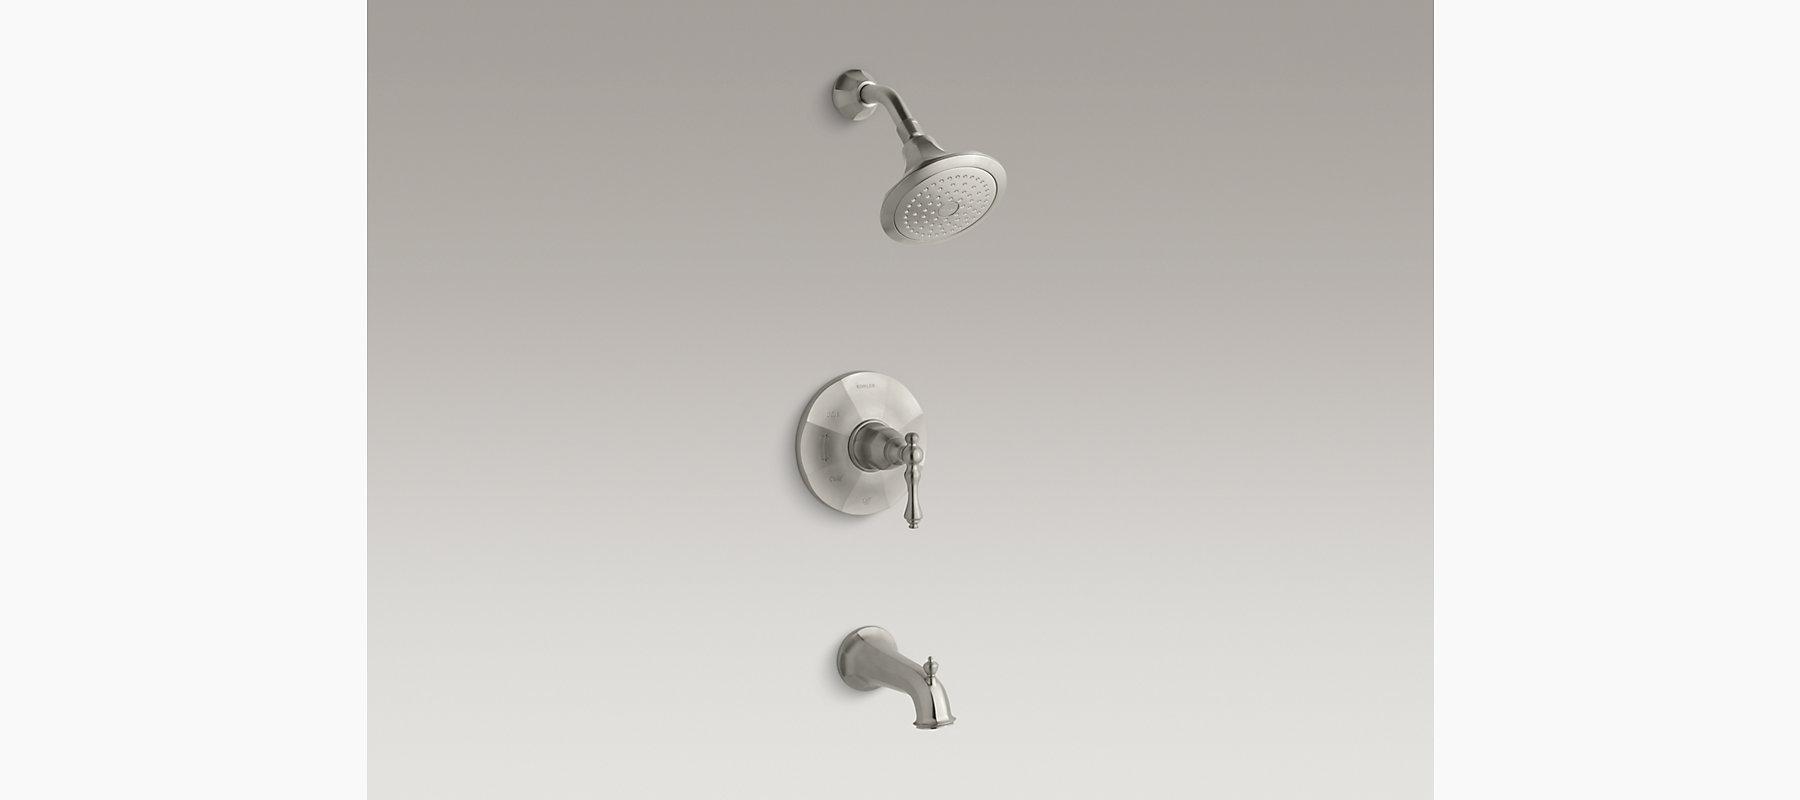 Kelston Rite-Temp Bath and Shower Faucet Trim | K-R13492-4 | KOHLER